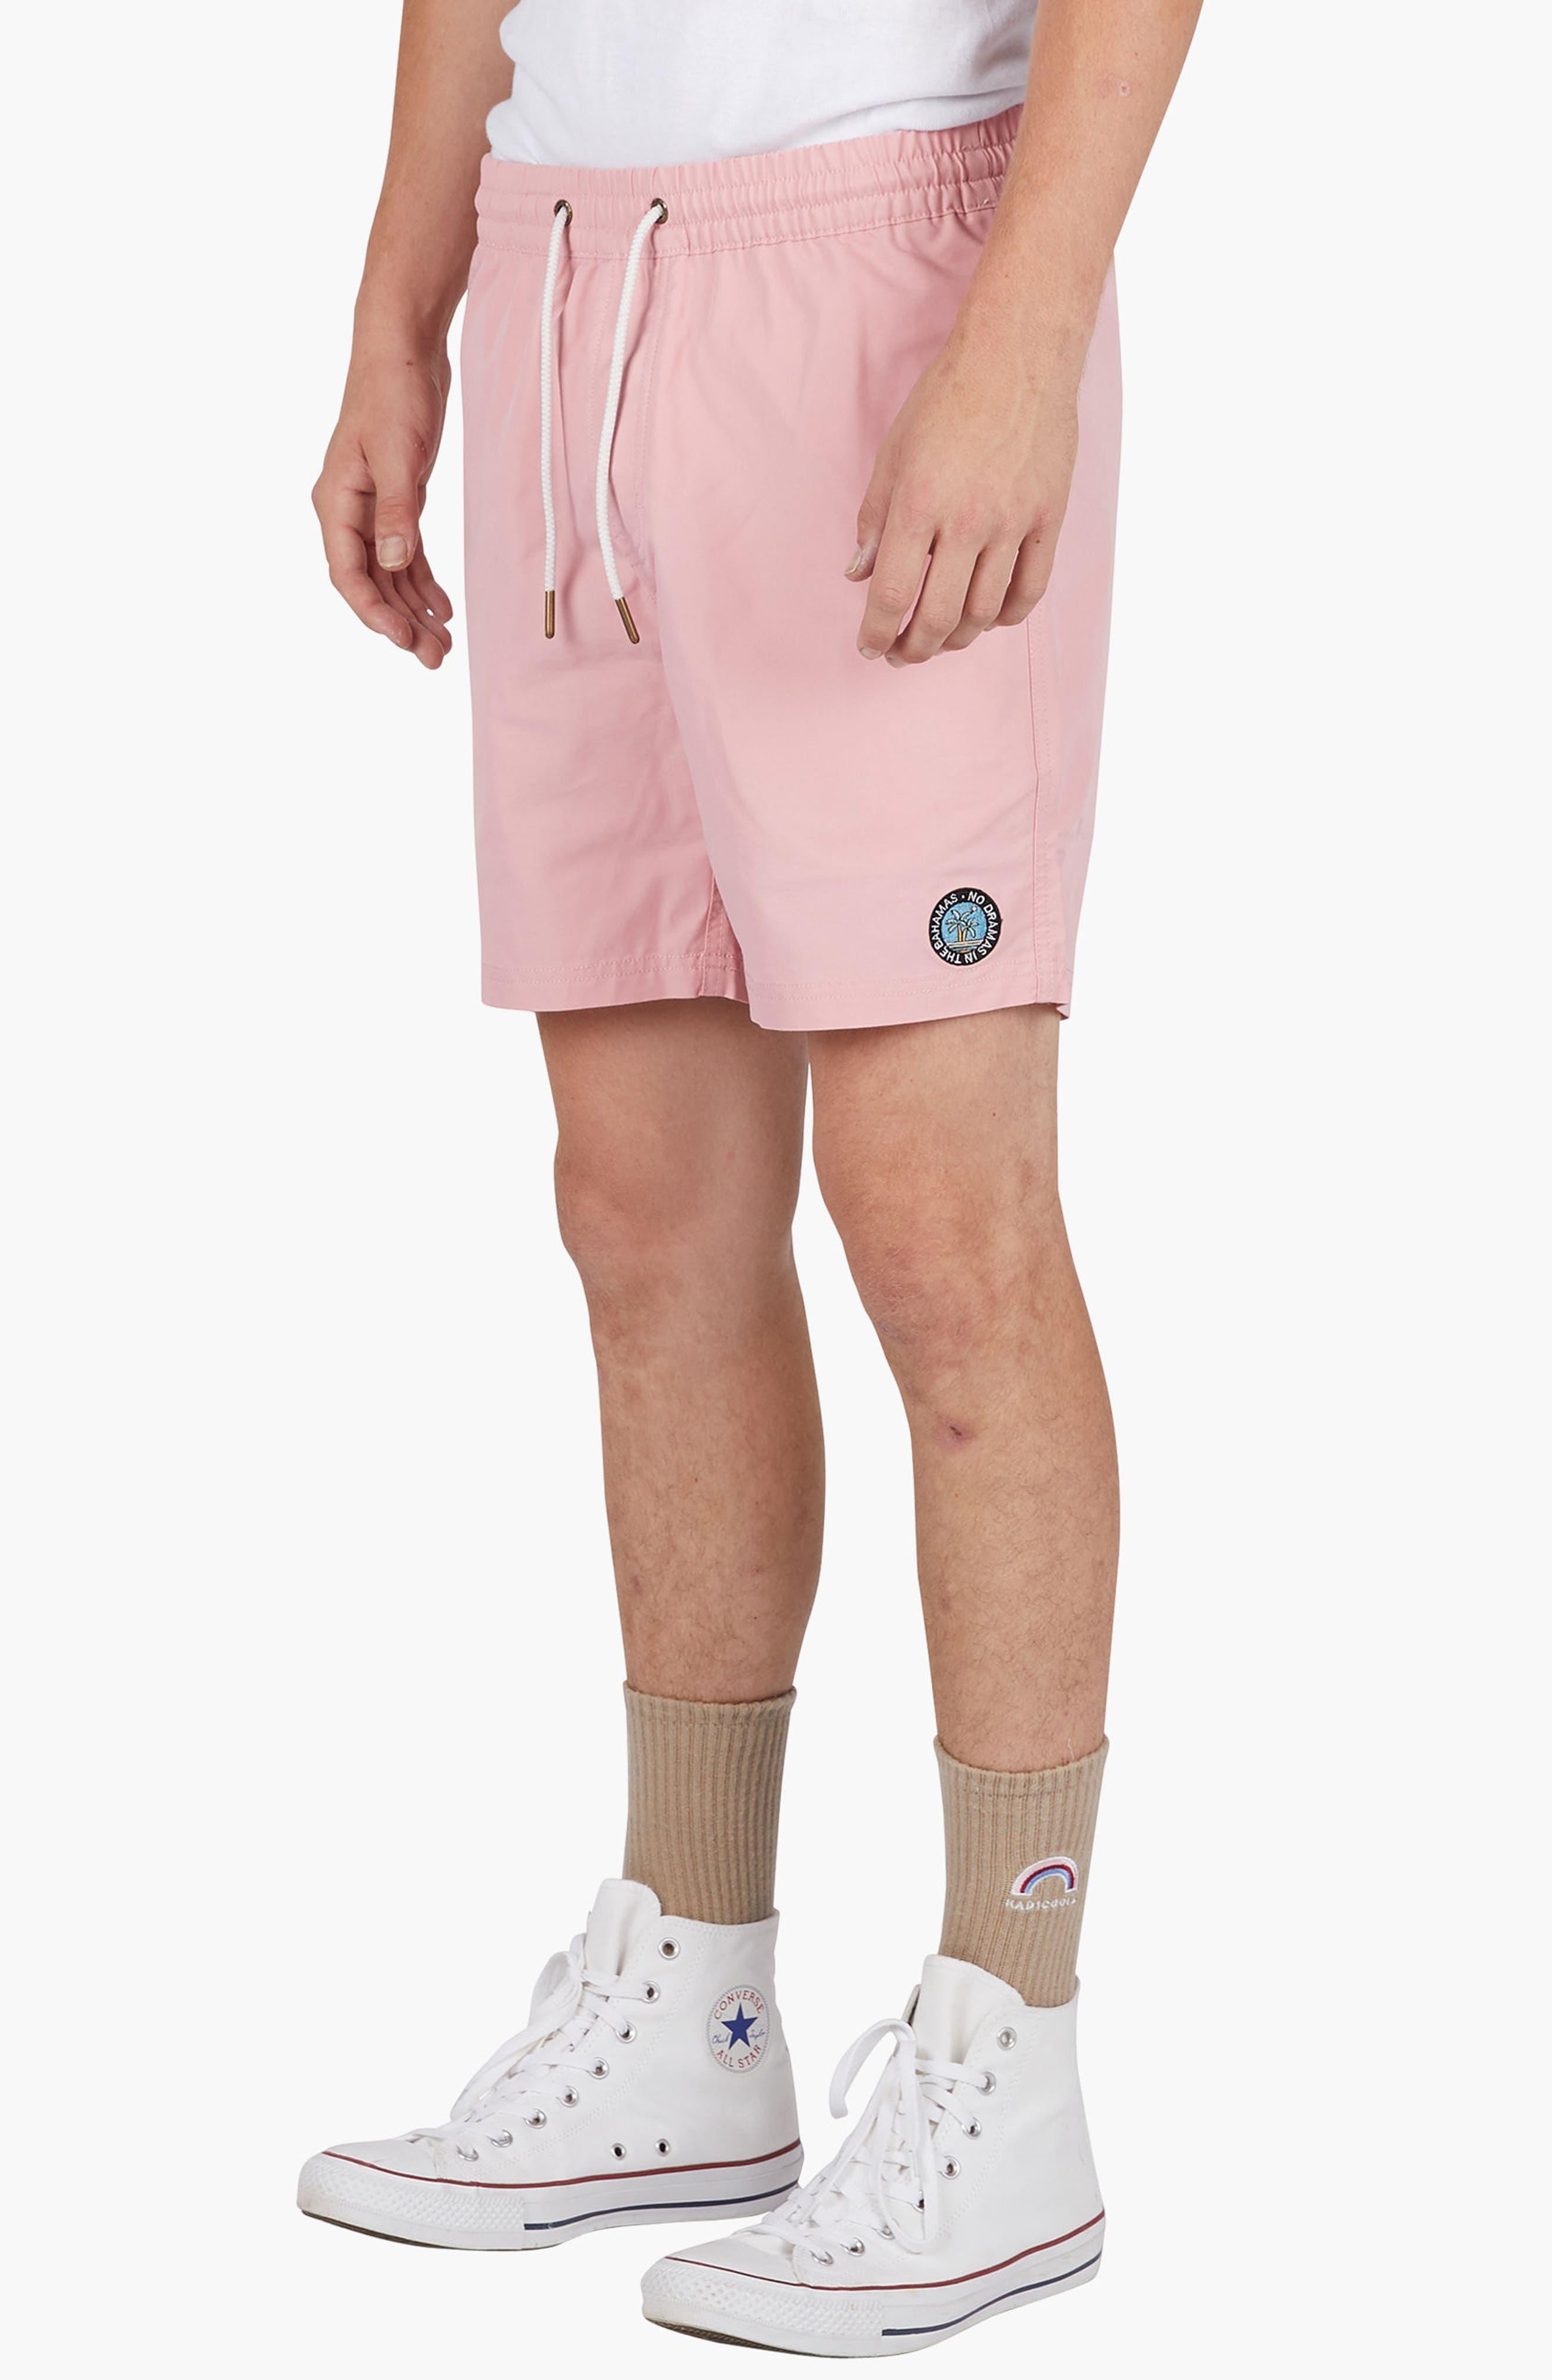 Amphibious Shorts,                             Alternate thumbnail 4, color,                             661